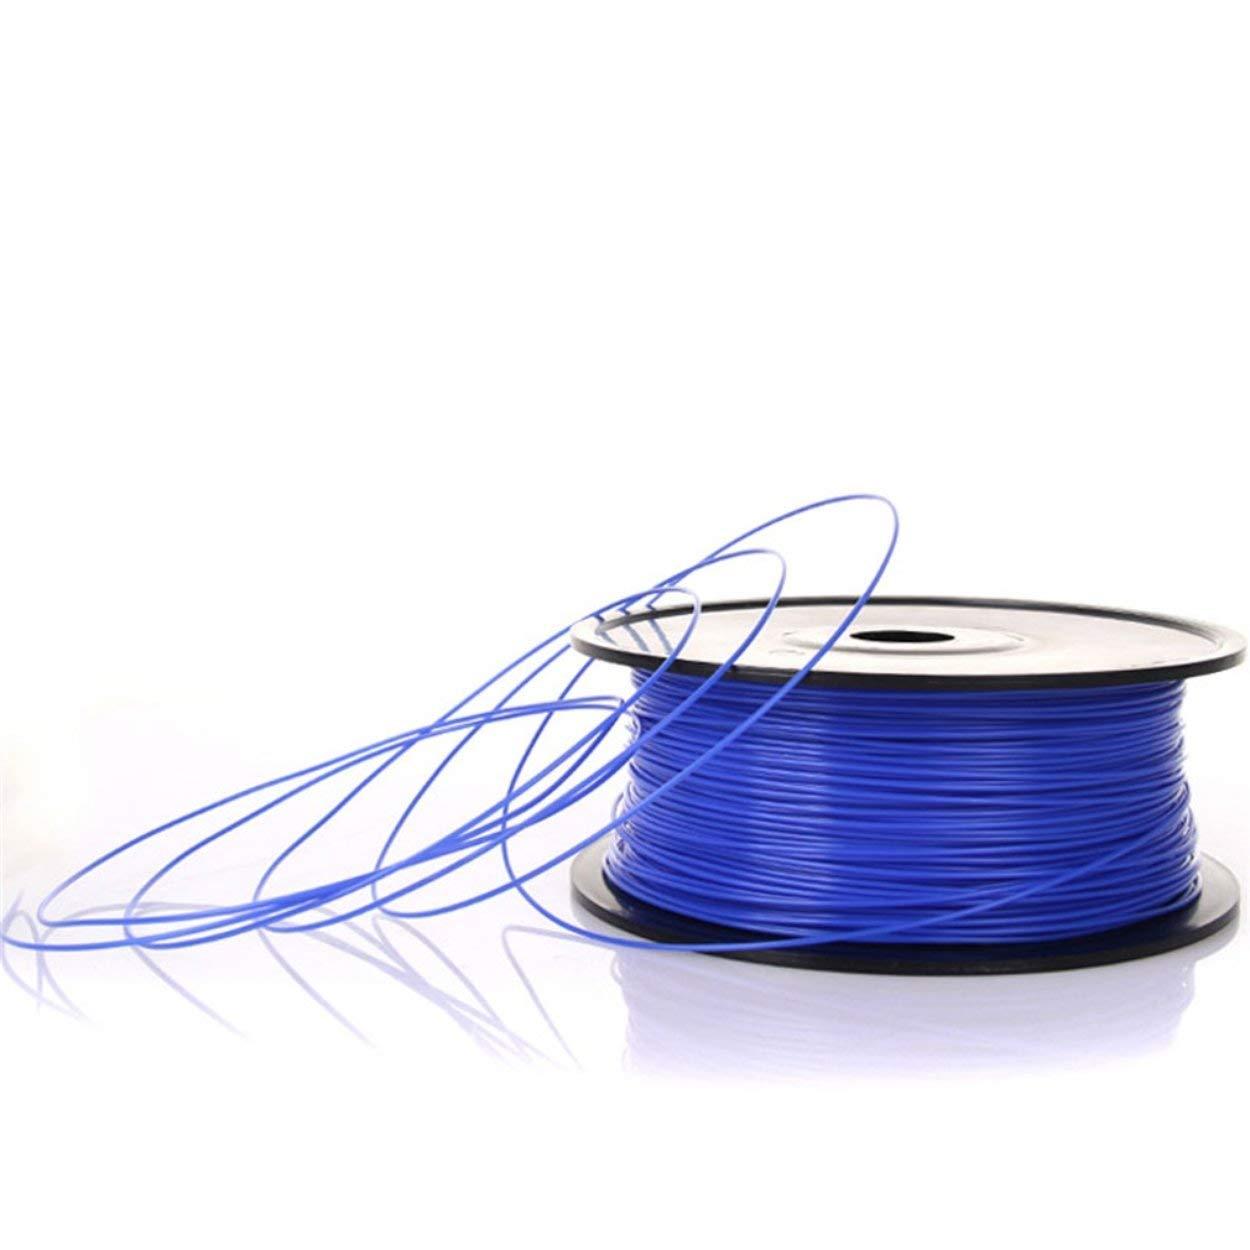 Losenlli Filamento de Impresora 3D de Alta Resistencia Bajo ...